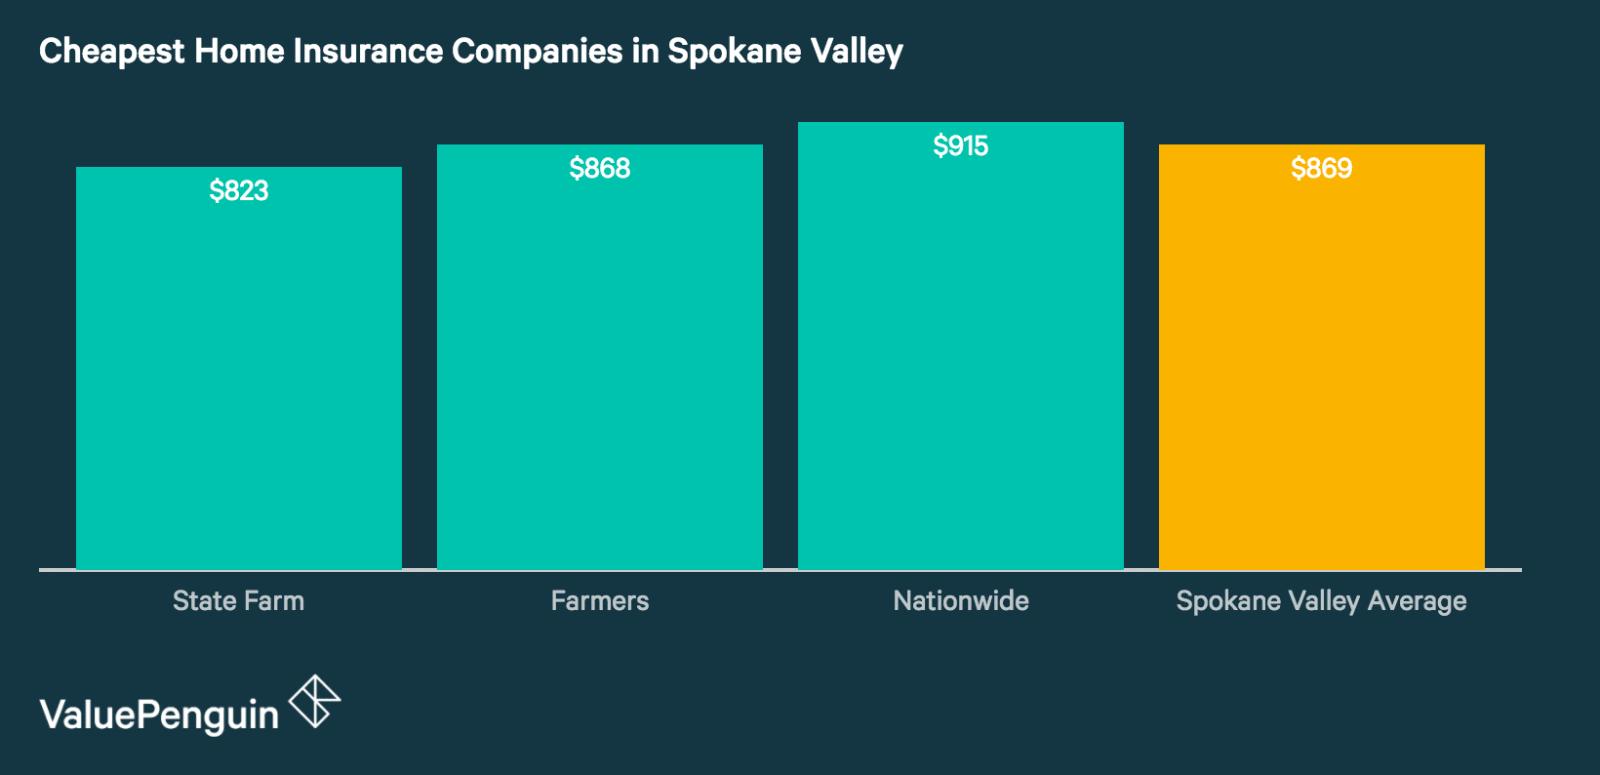 Best Cheap Home Insurance Companies in Spokane Valley